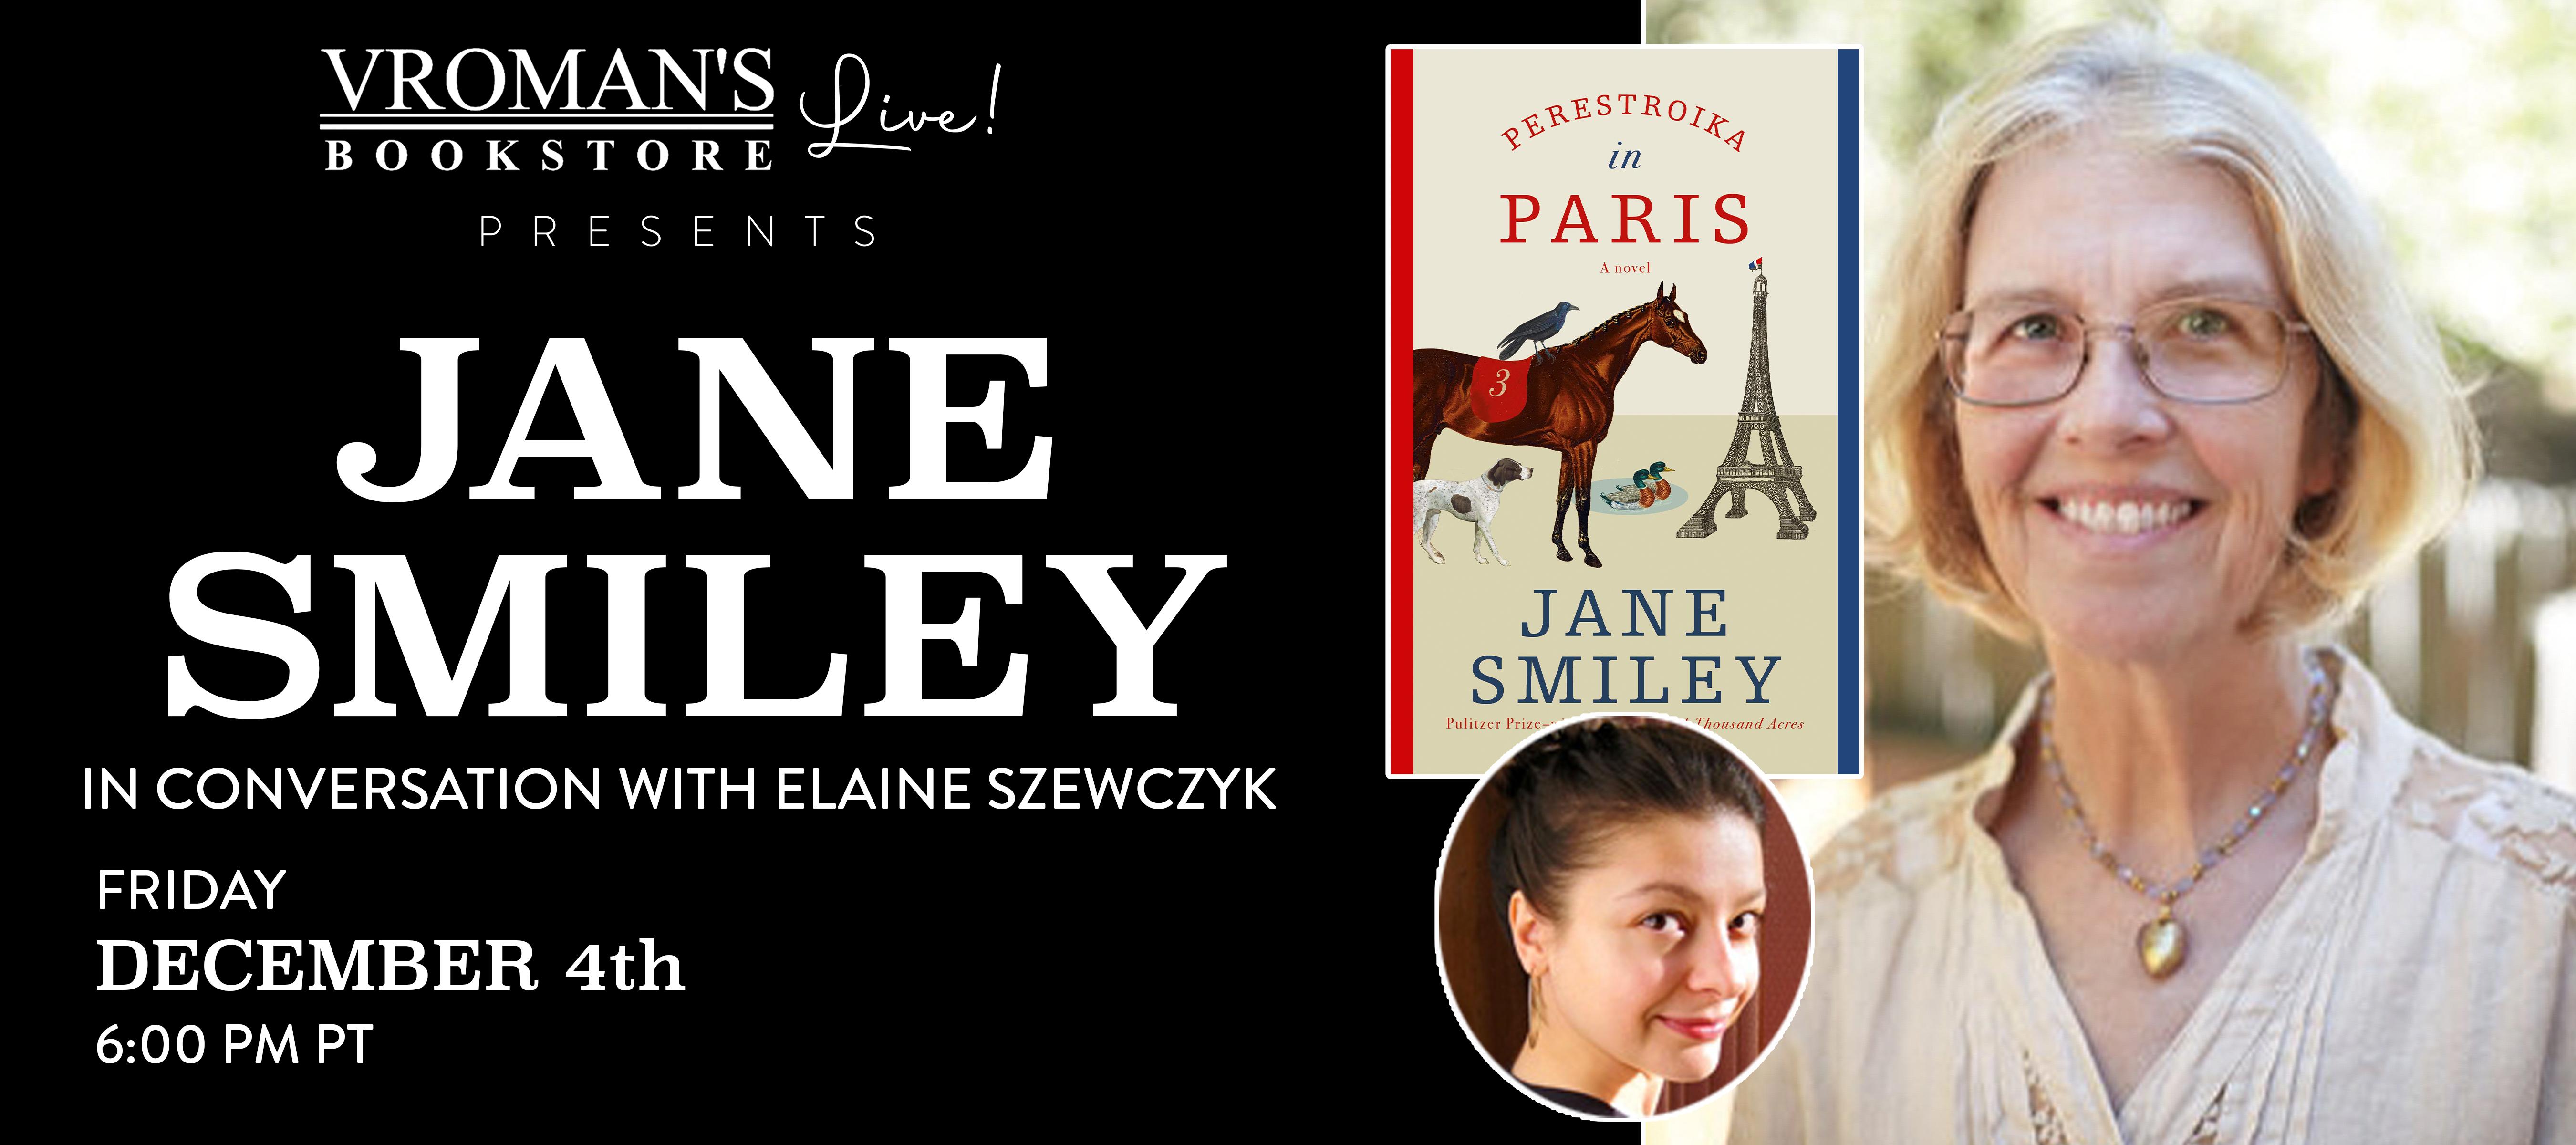 Jane Smiley event banner